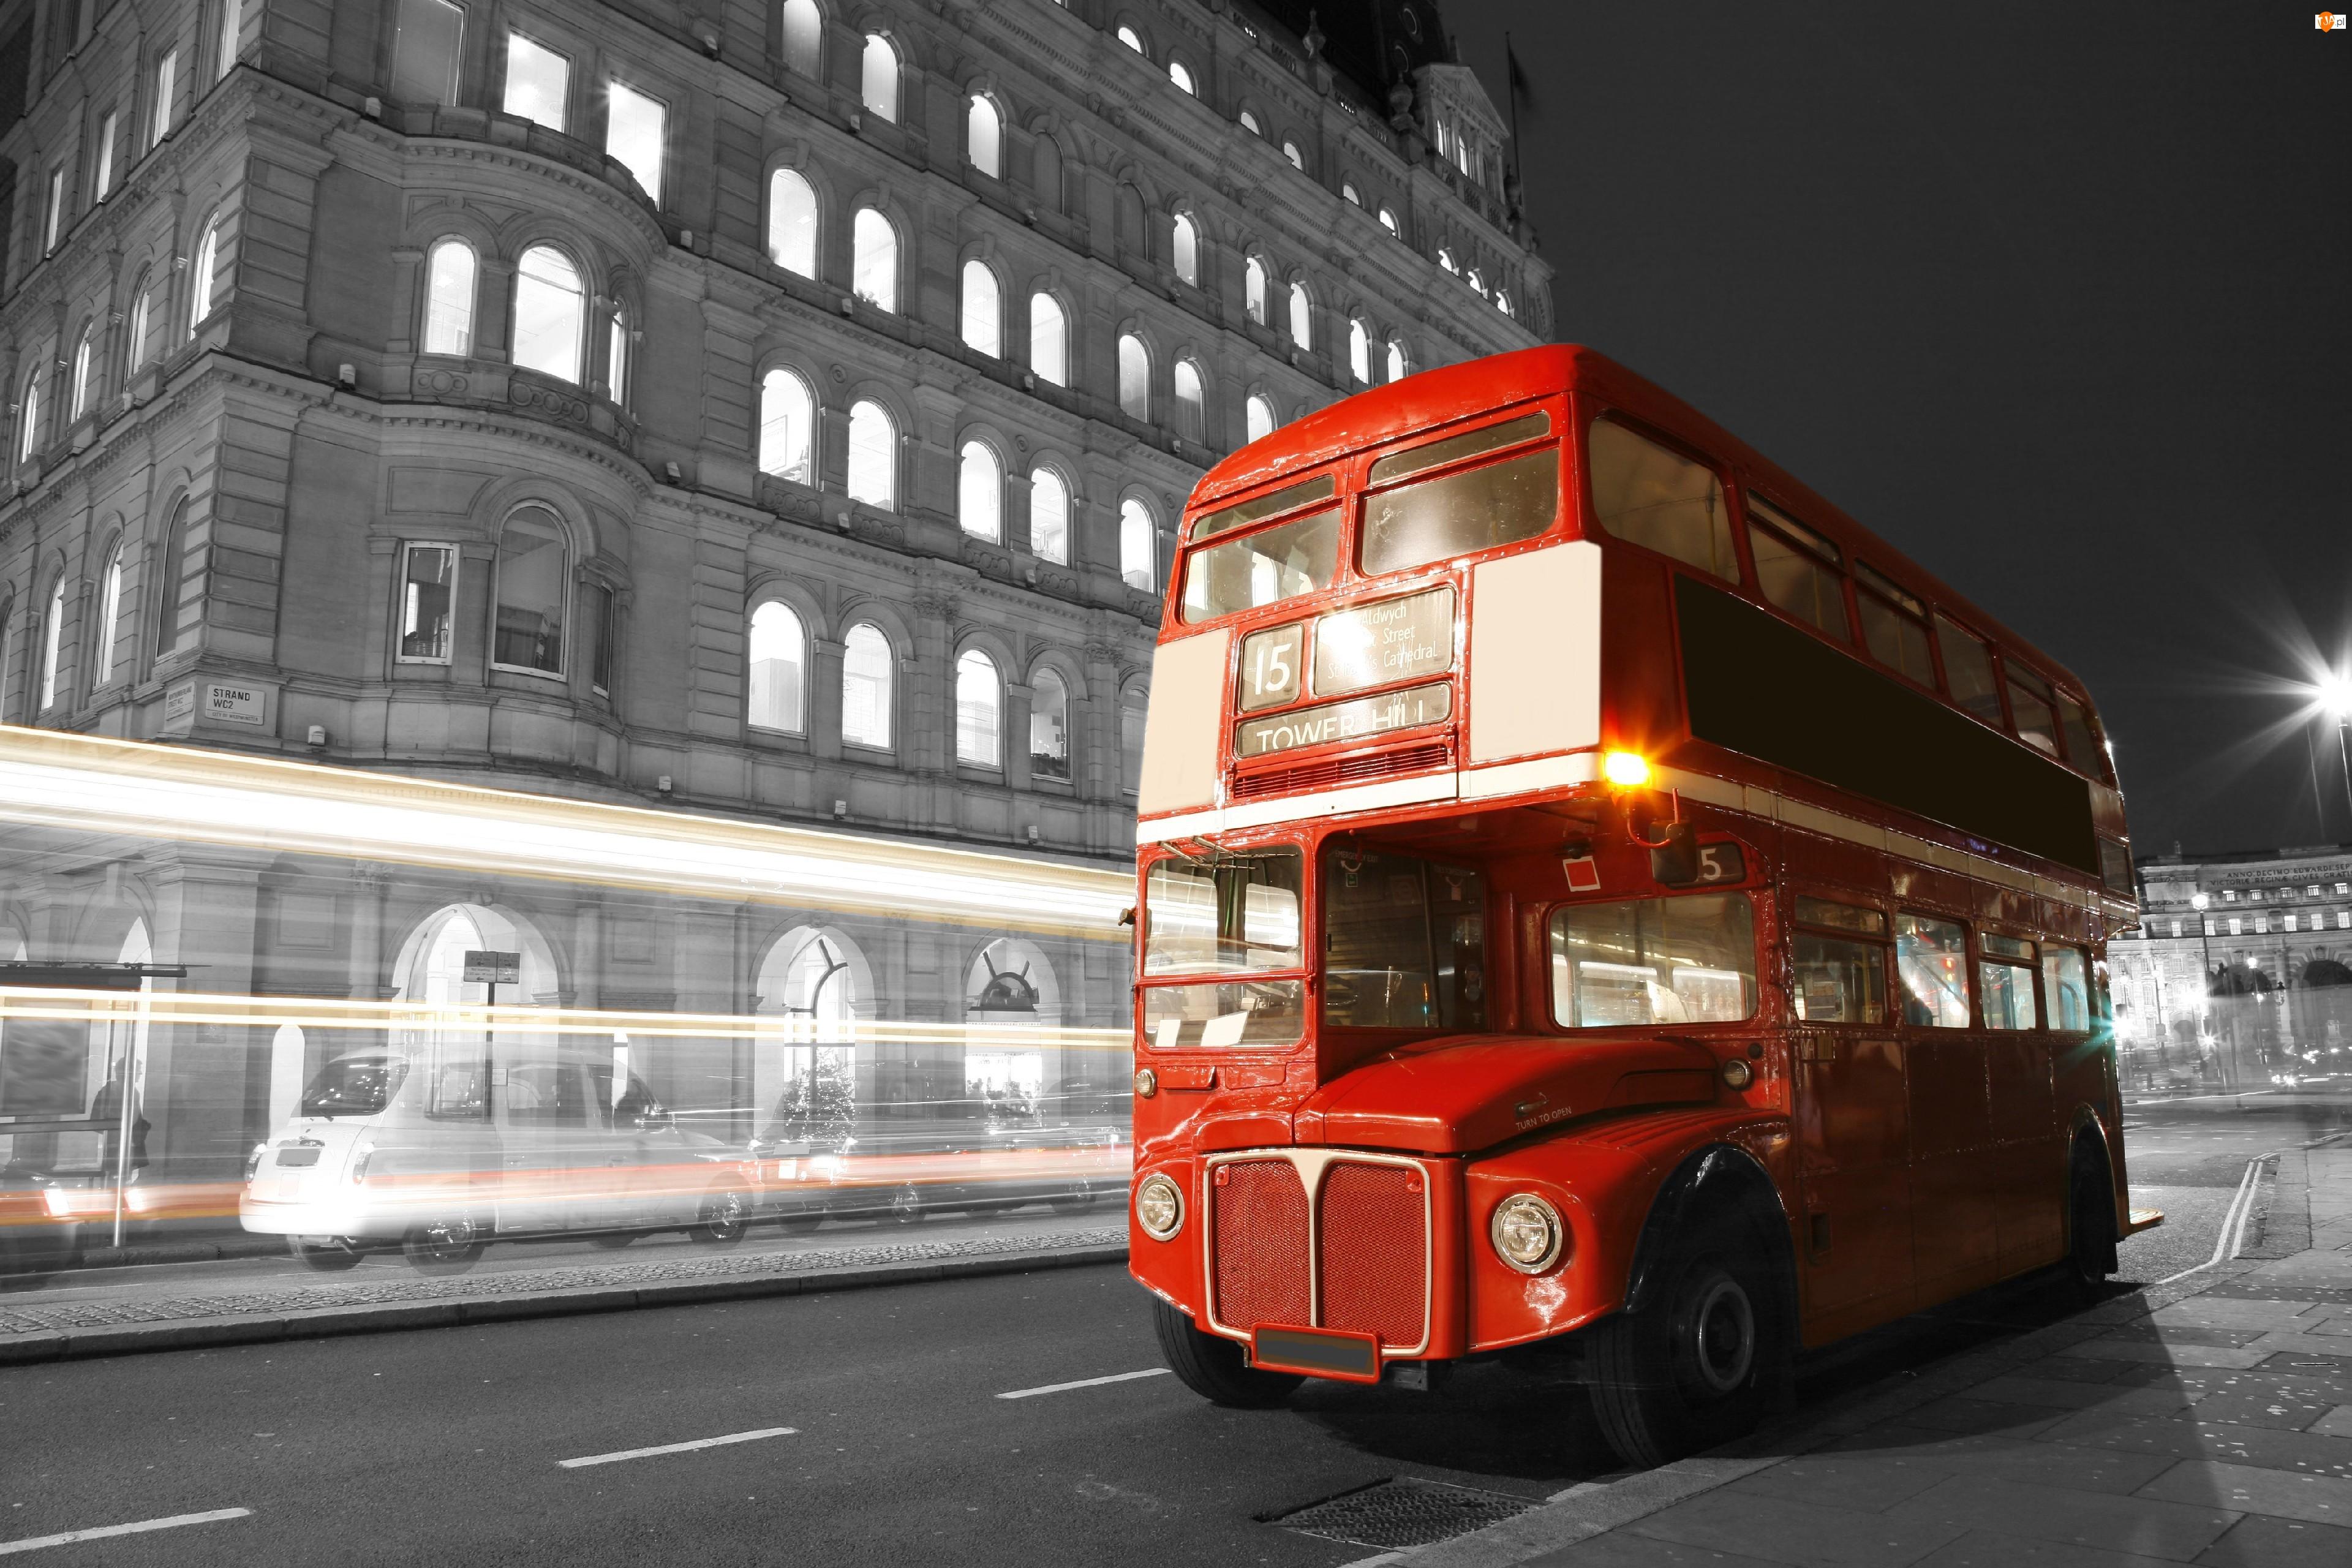 Miasto, Autobus, Piętrowy